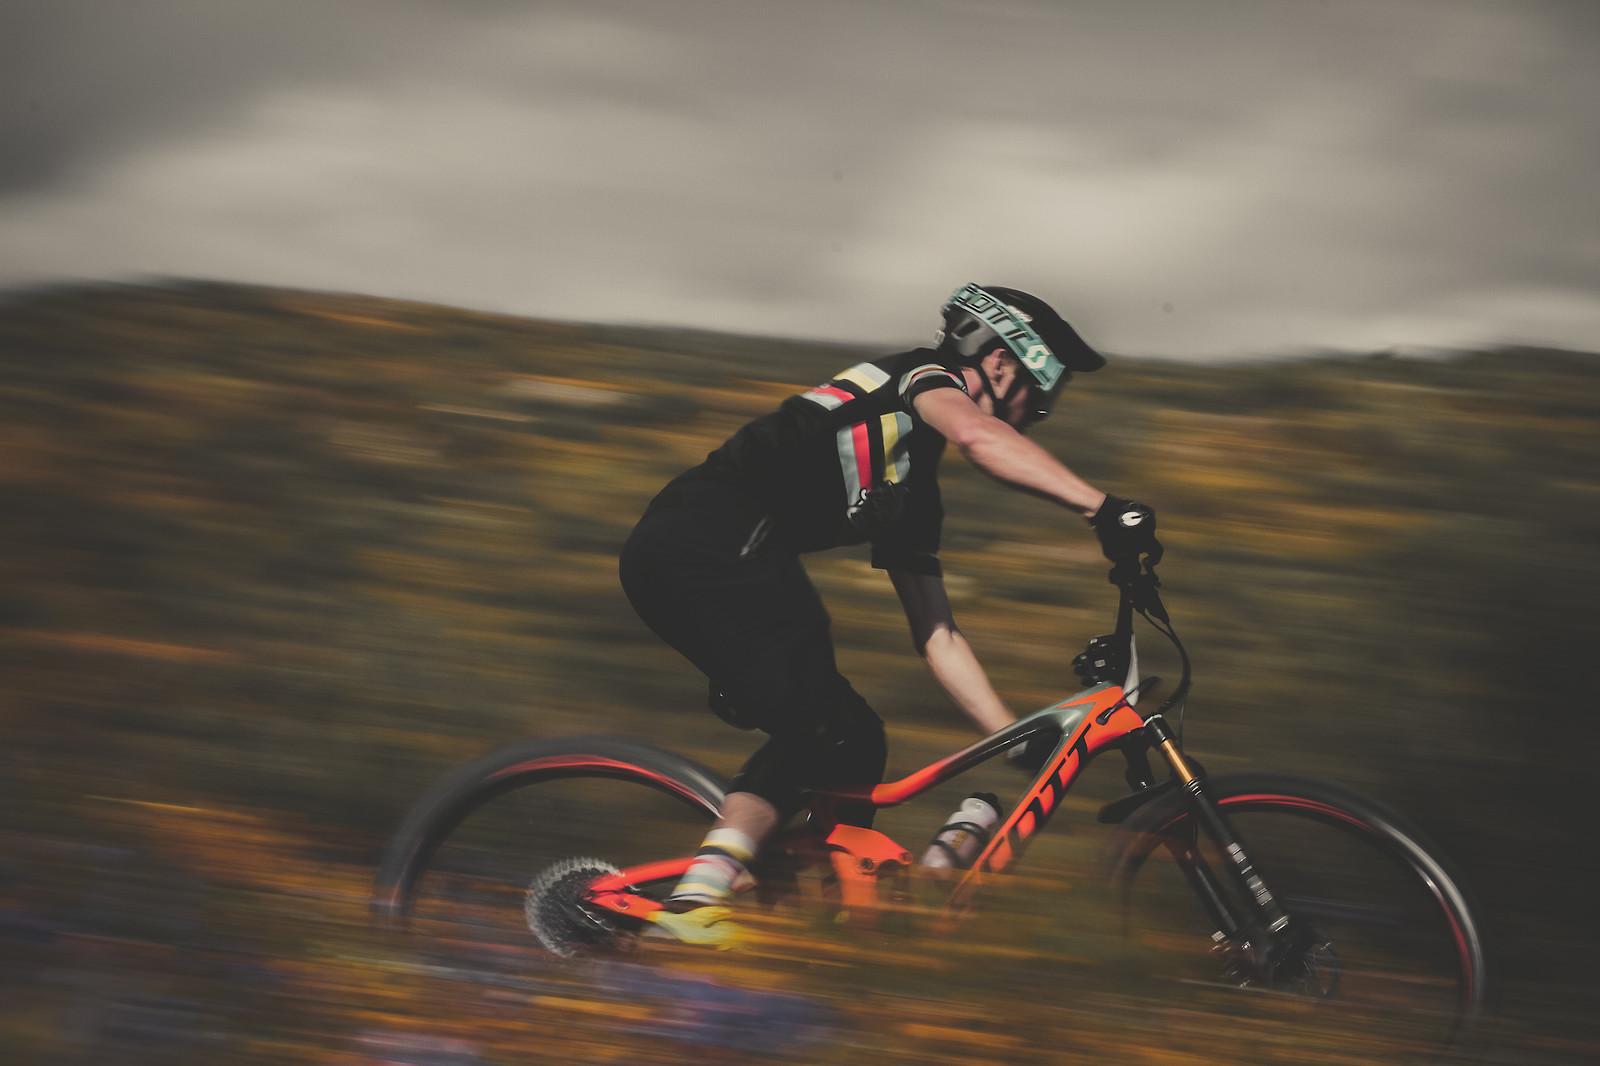 IMG 2072-4 - Liam Donohue - Mountain Biking Pictures - Vital MTB